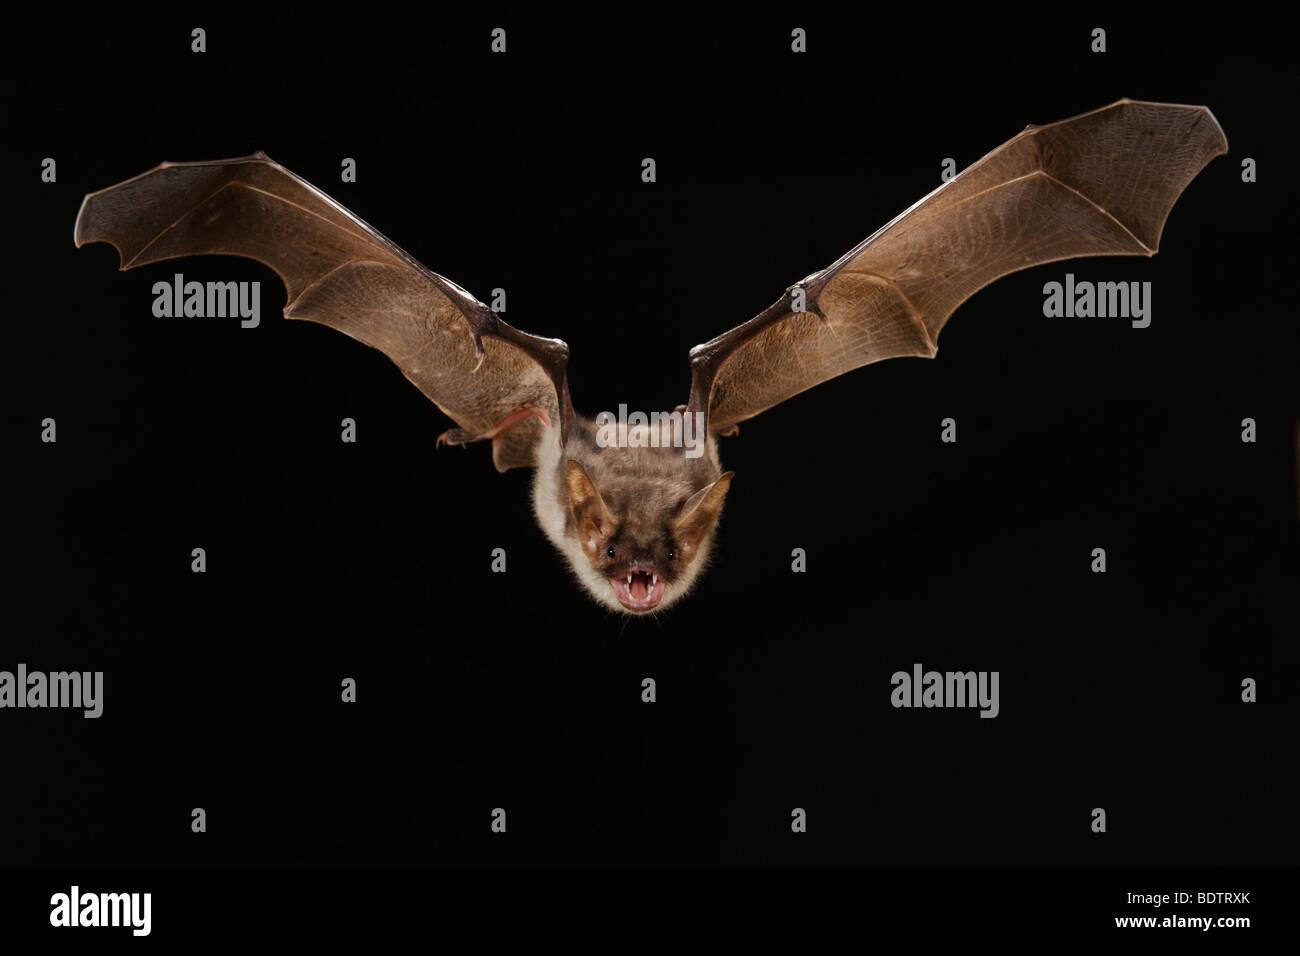 Myotis myotis, Greater Mouse-eared Bat Stock Photo